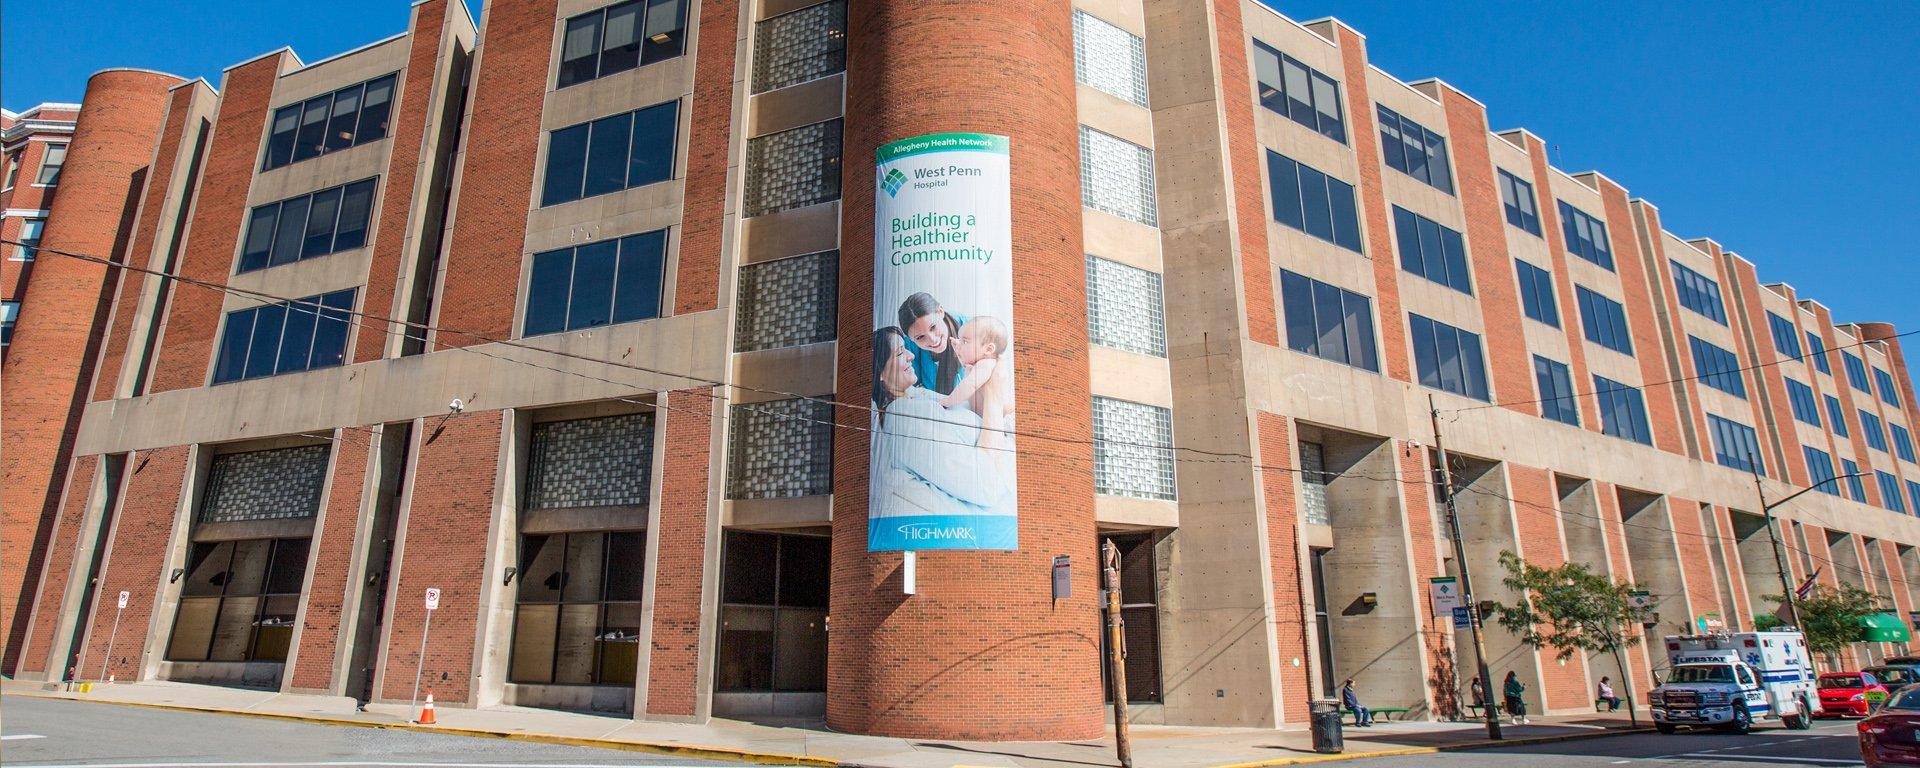 West Penn Hospital Entrance